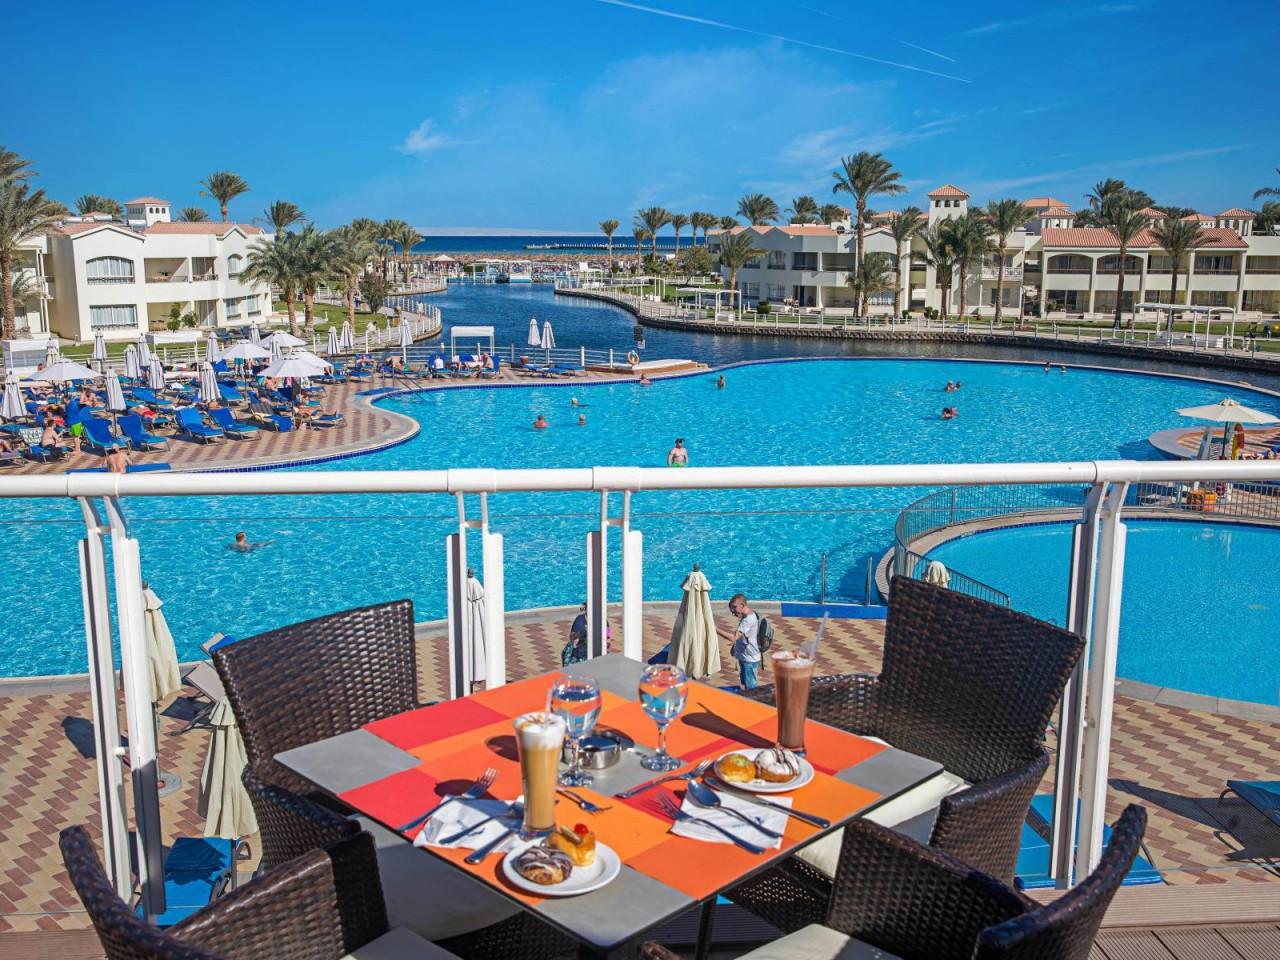 WINTER STAYCATION: Dana Beach Hotel, Hurghada